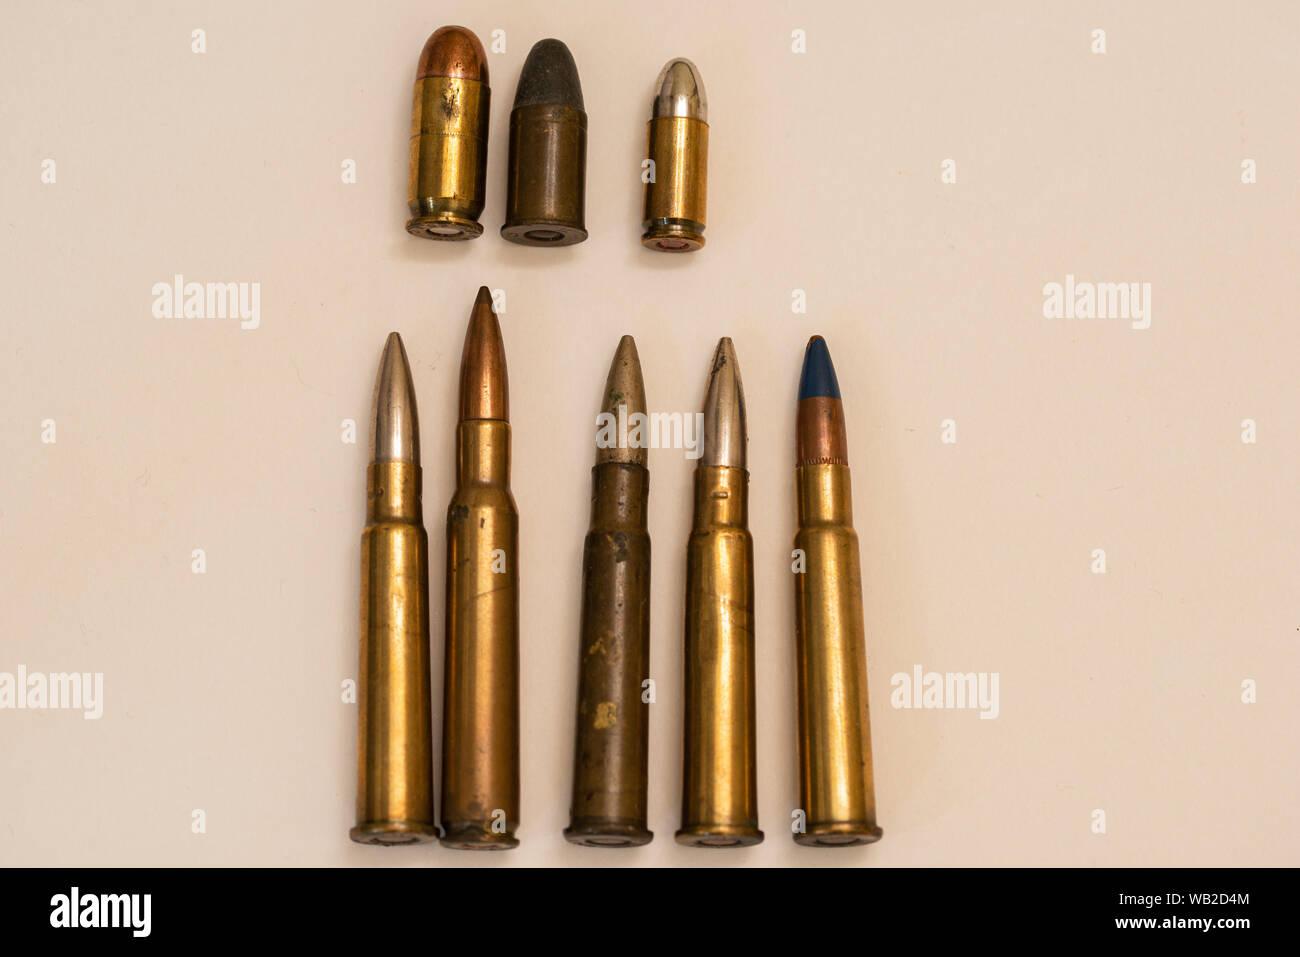 303 Bullet Stock Photos &  303 Bullet Stock Images - Alamy